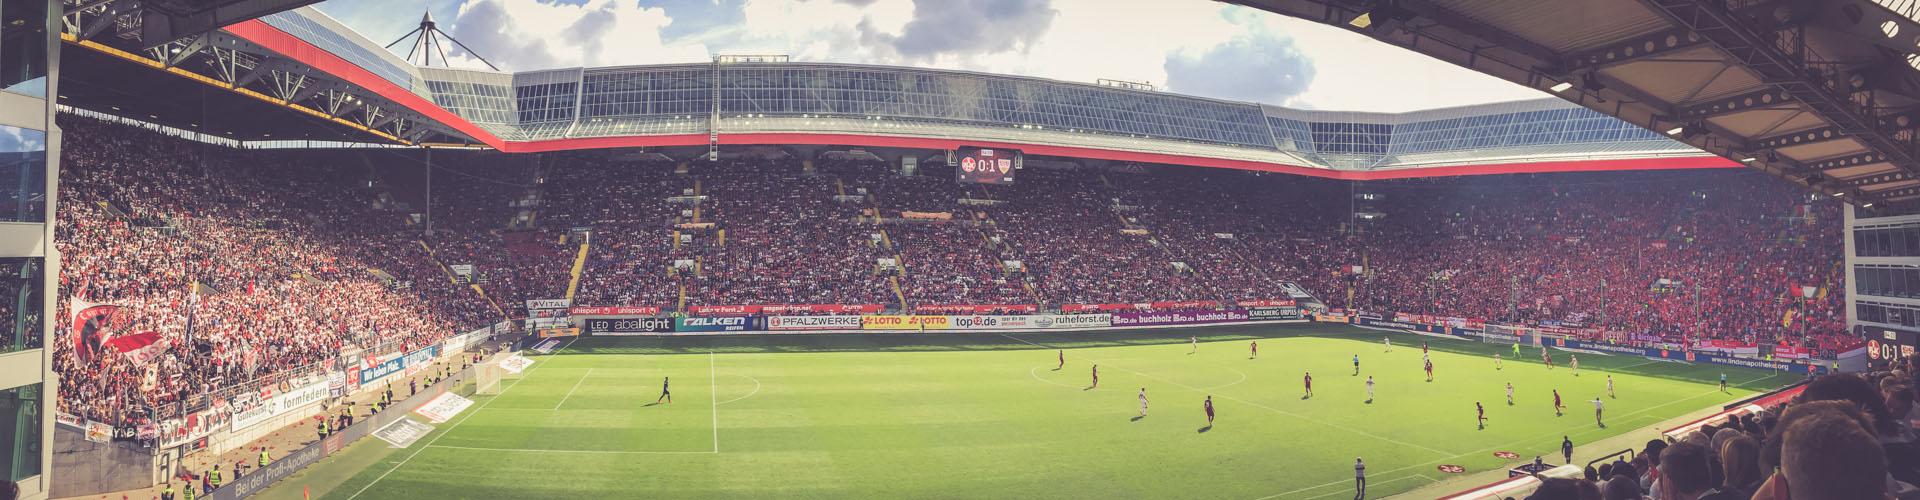 Fritz Walter Stadion - Betzenberg, Kaiserslautern